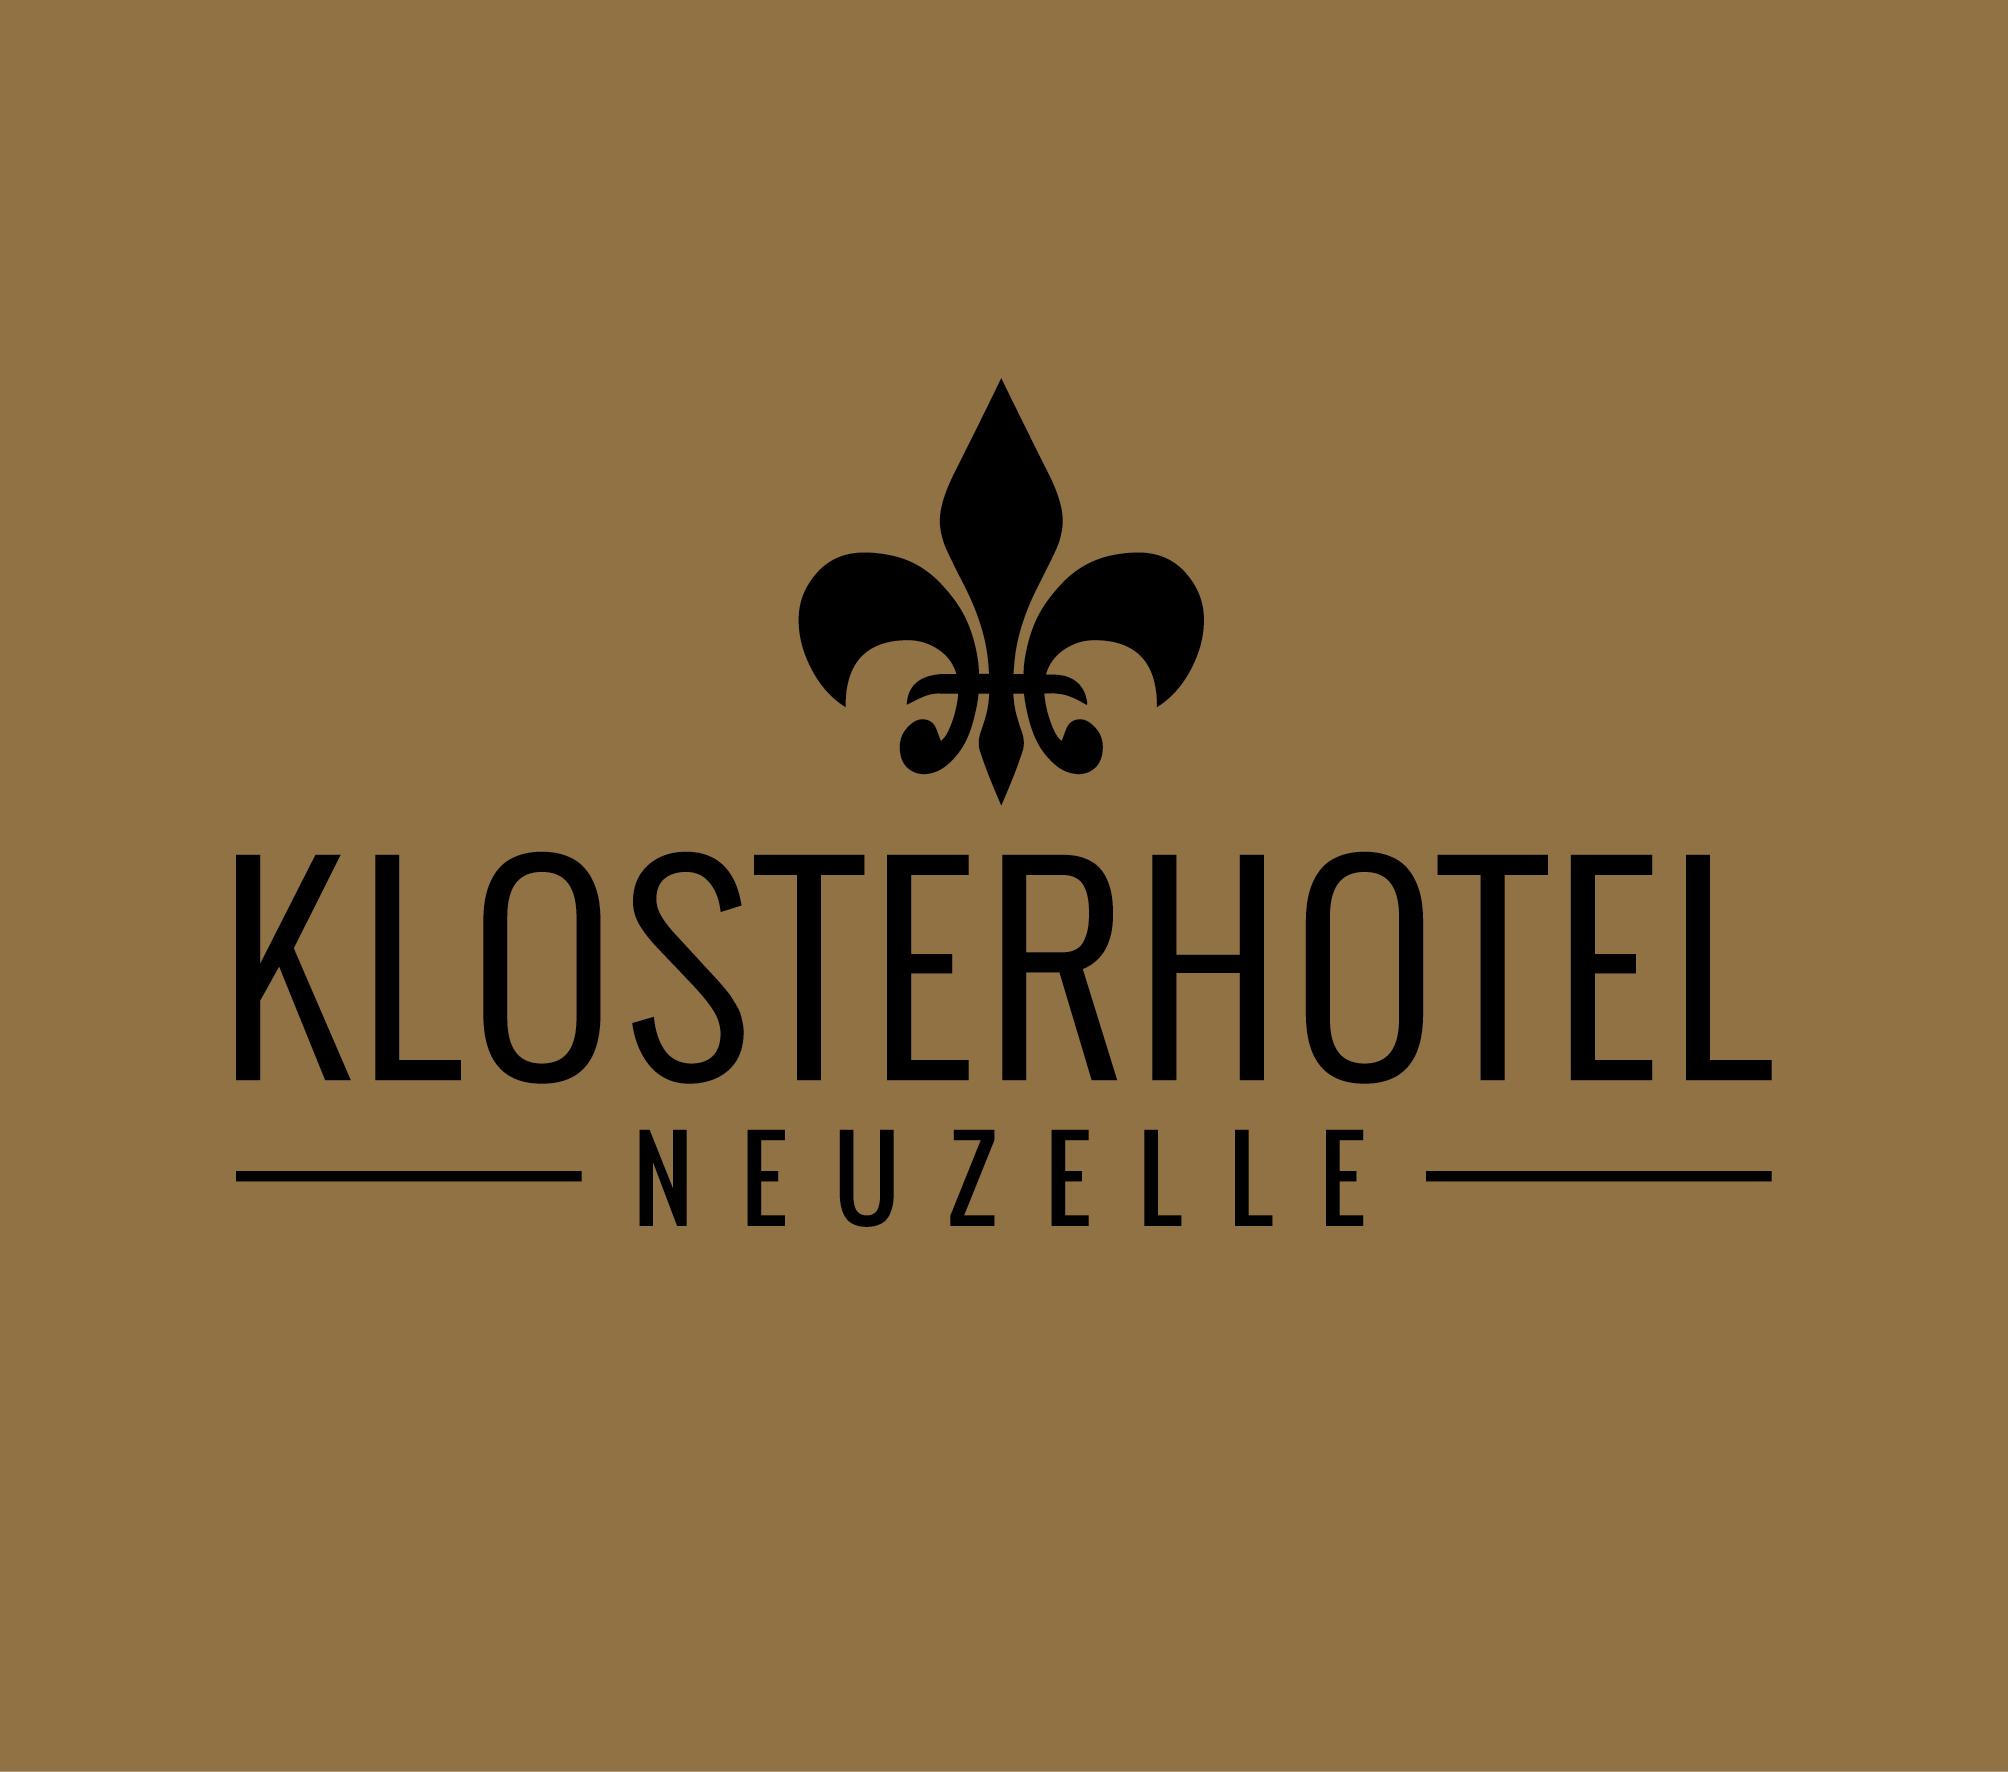 grafik design | klosterhotel neuzelle